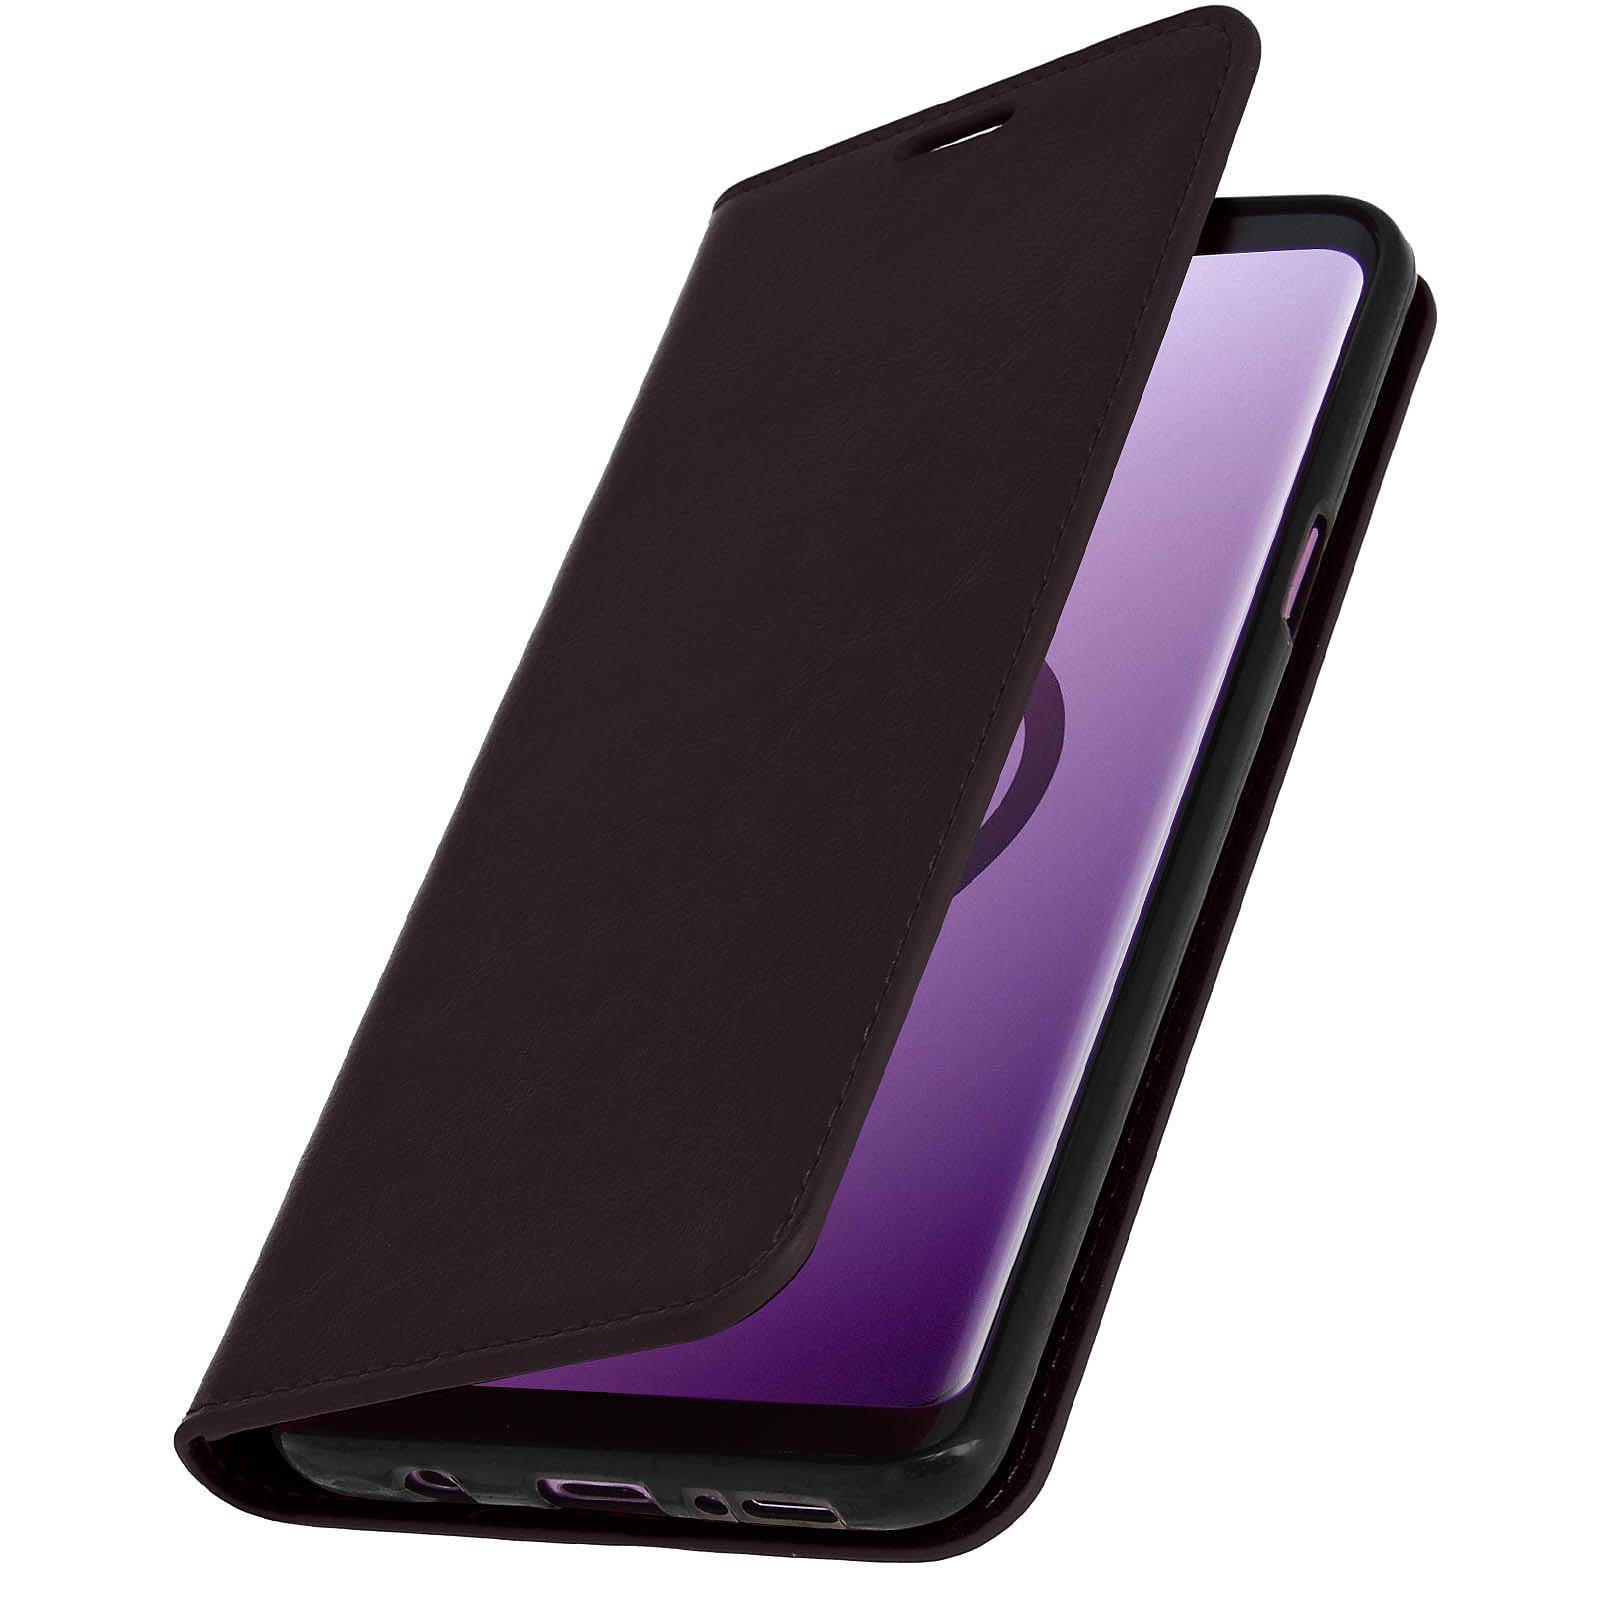 Avizar Etui folio Marron pour Samsung Galaxy S9 Plus